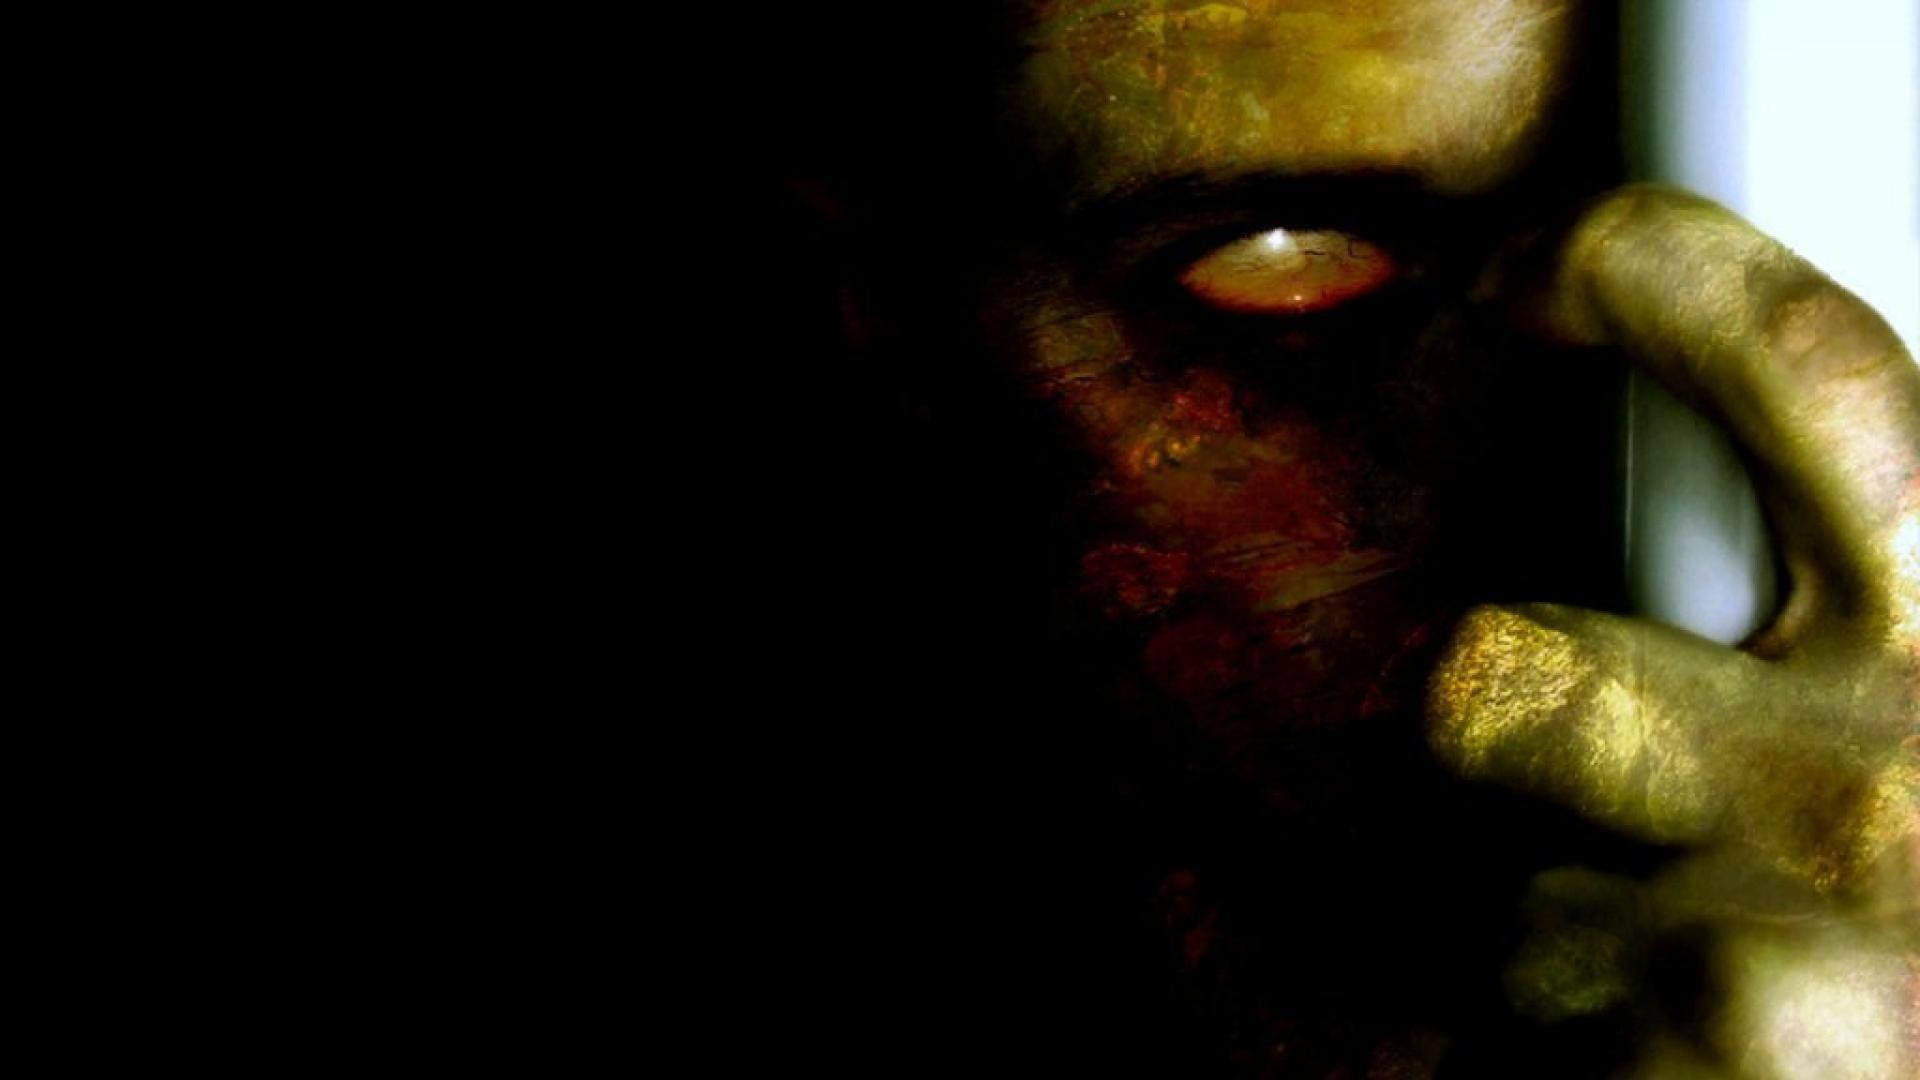 Zombie Horror Fantasy Scary Wallpaper At Dark Wallpapers